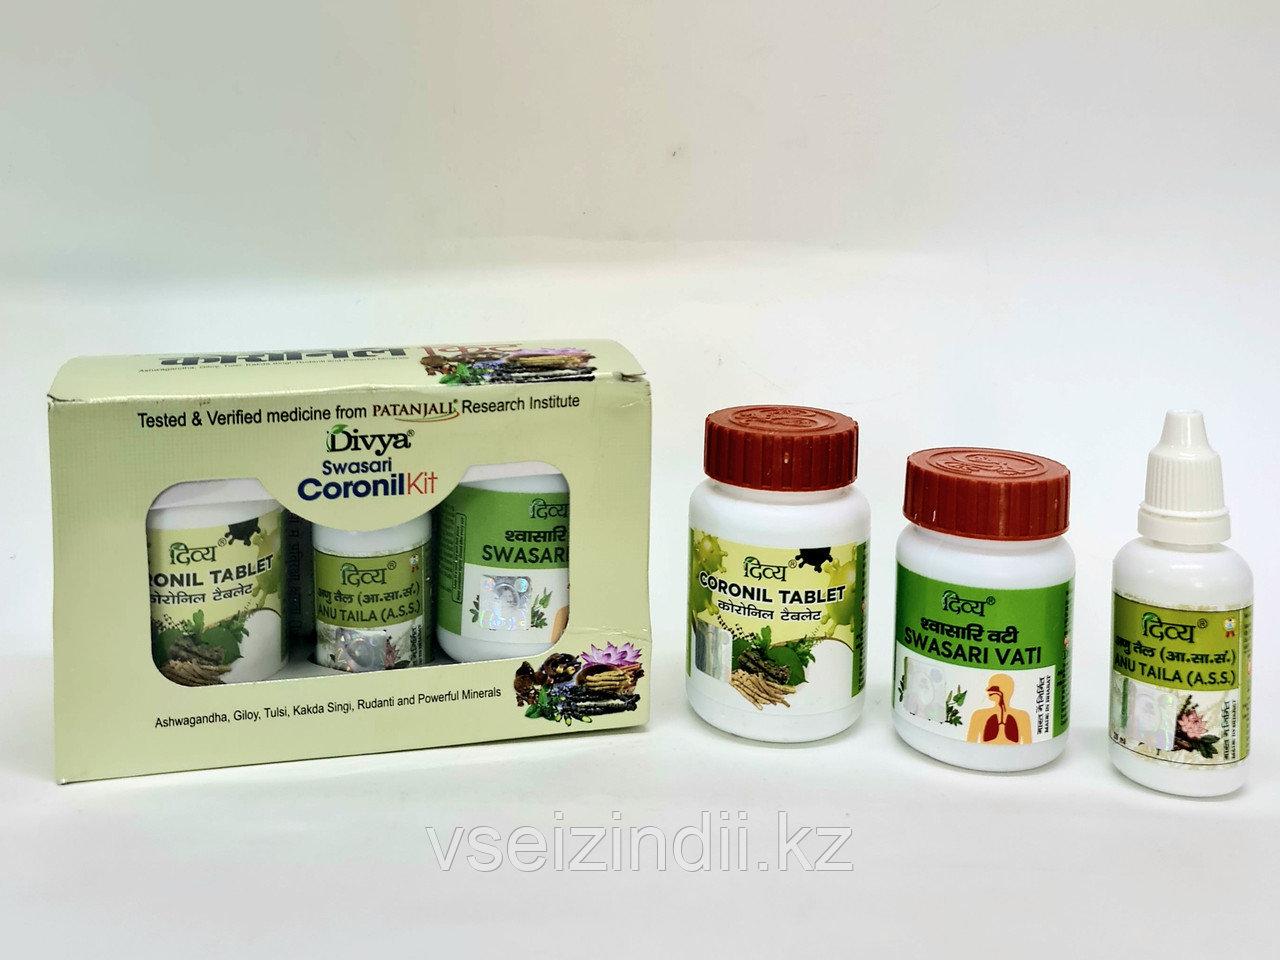 Коронил СoronilKit Patanjali, вирусные инфекции, коронавирус COVID-19